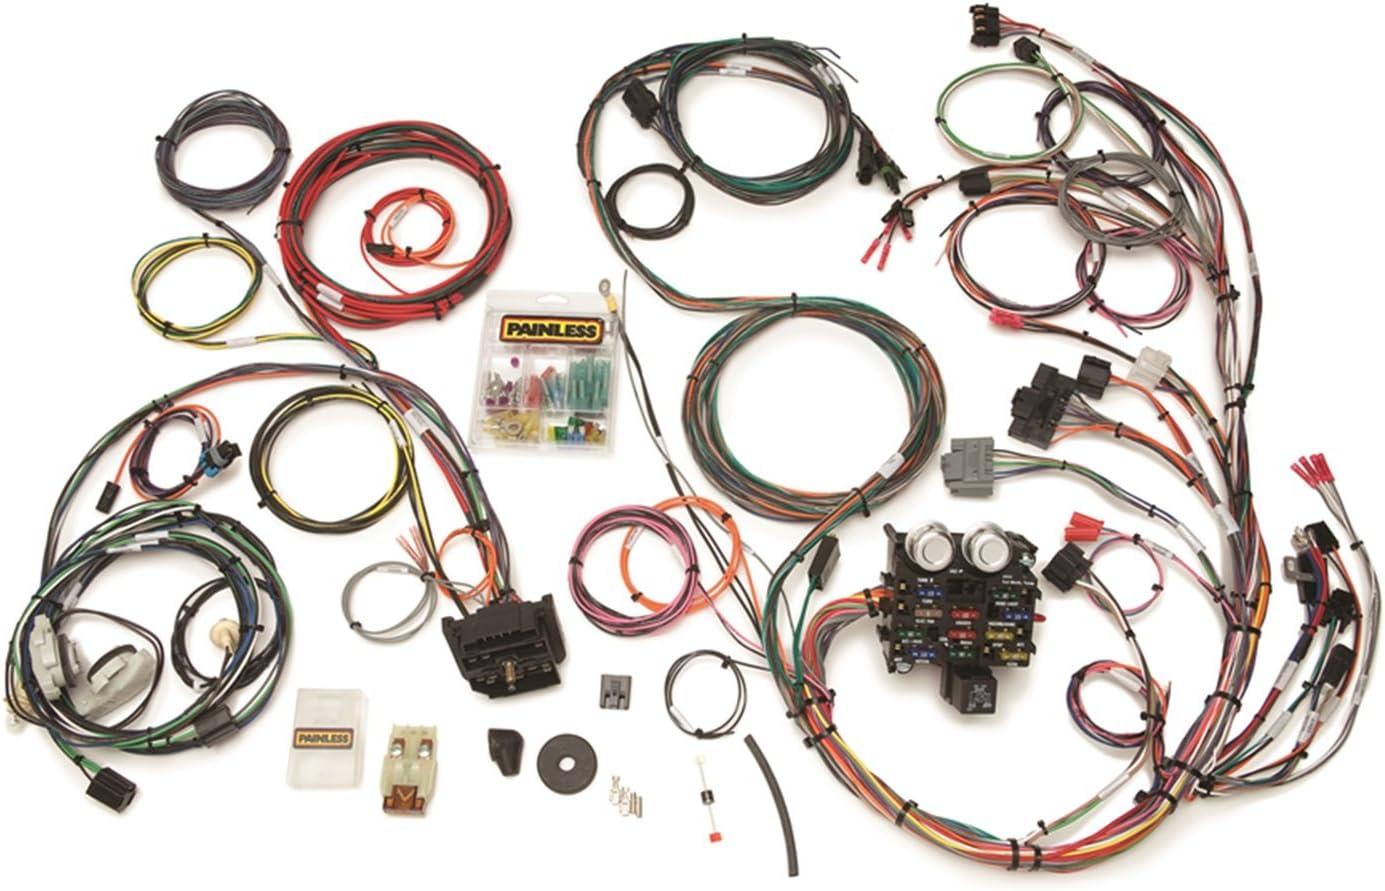 95 Jeep Wrangler Engine Wiring Harnes - Wiring Diagram ...